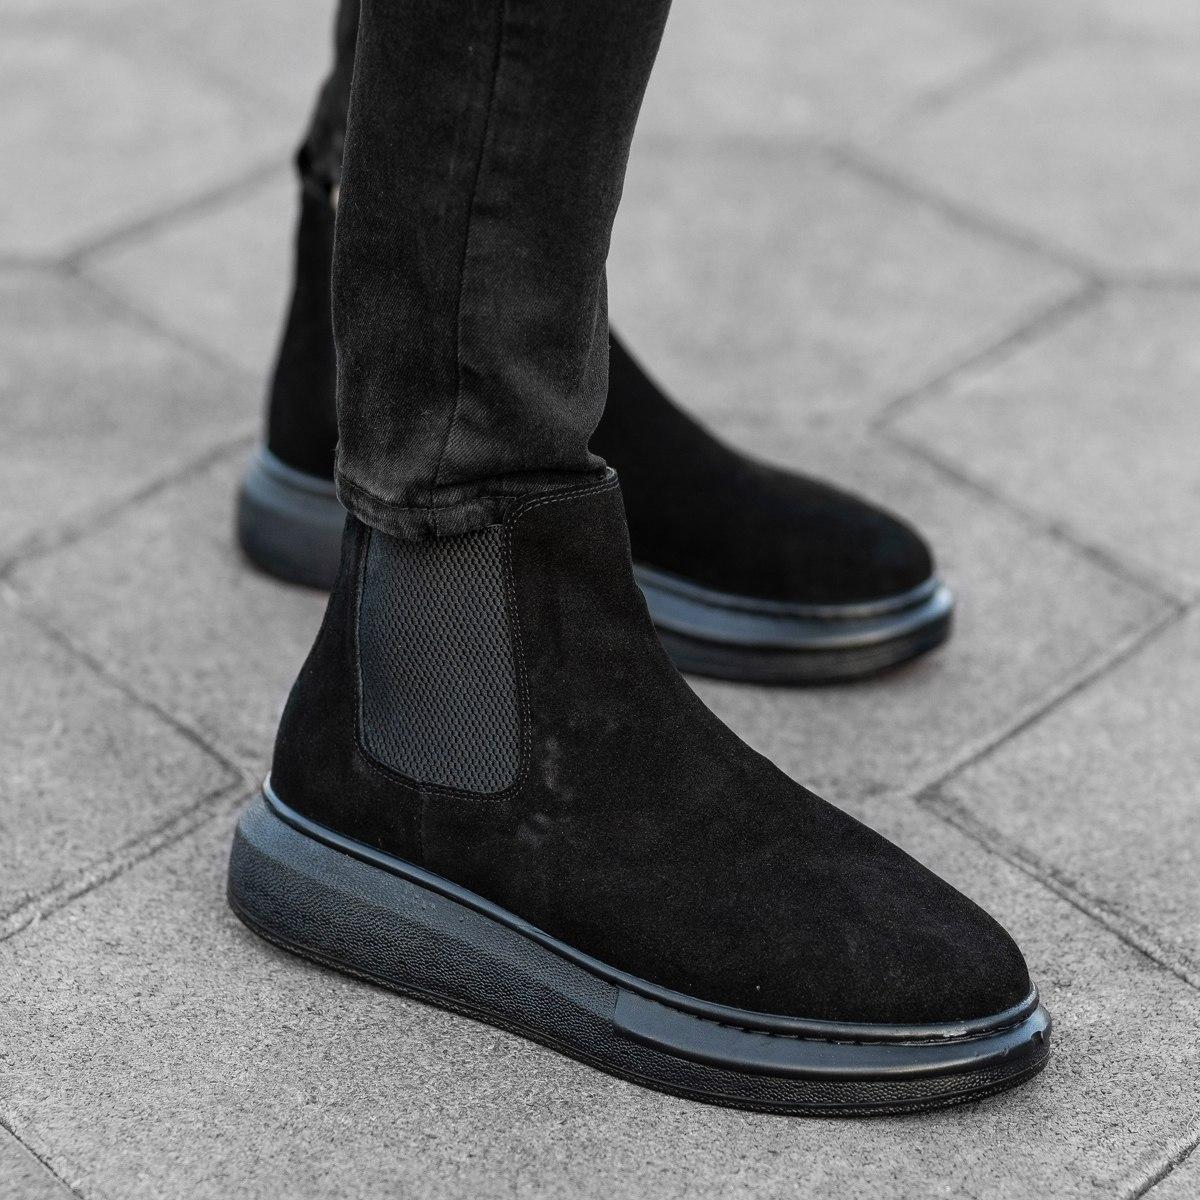 Genuine-Suede Hype Sole Chelsea Boots In Black Mv Premium Brand - 1